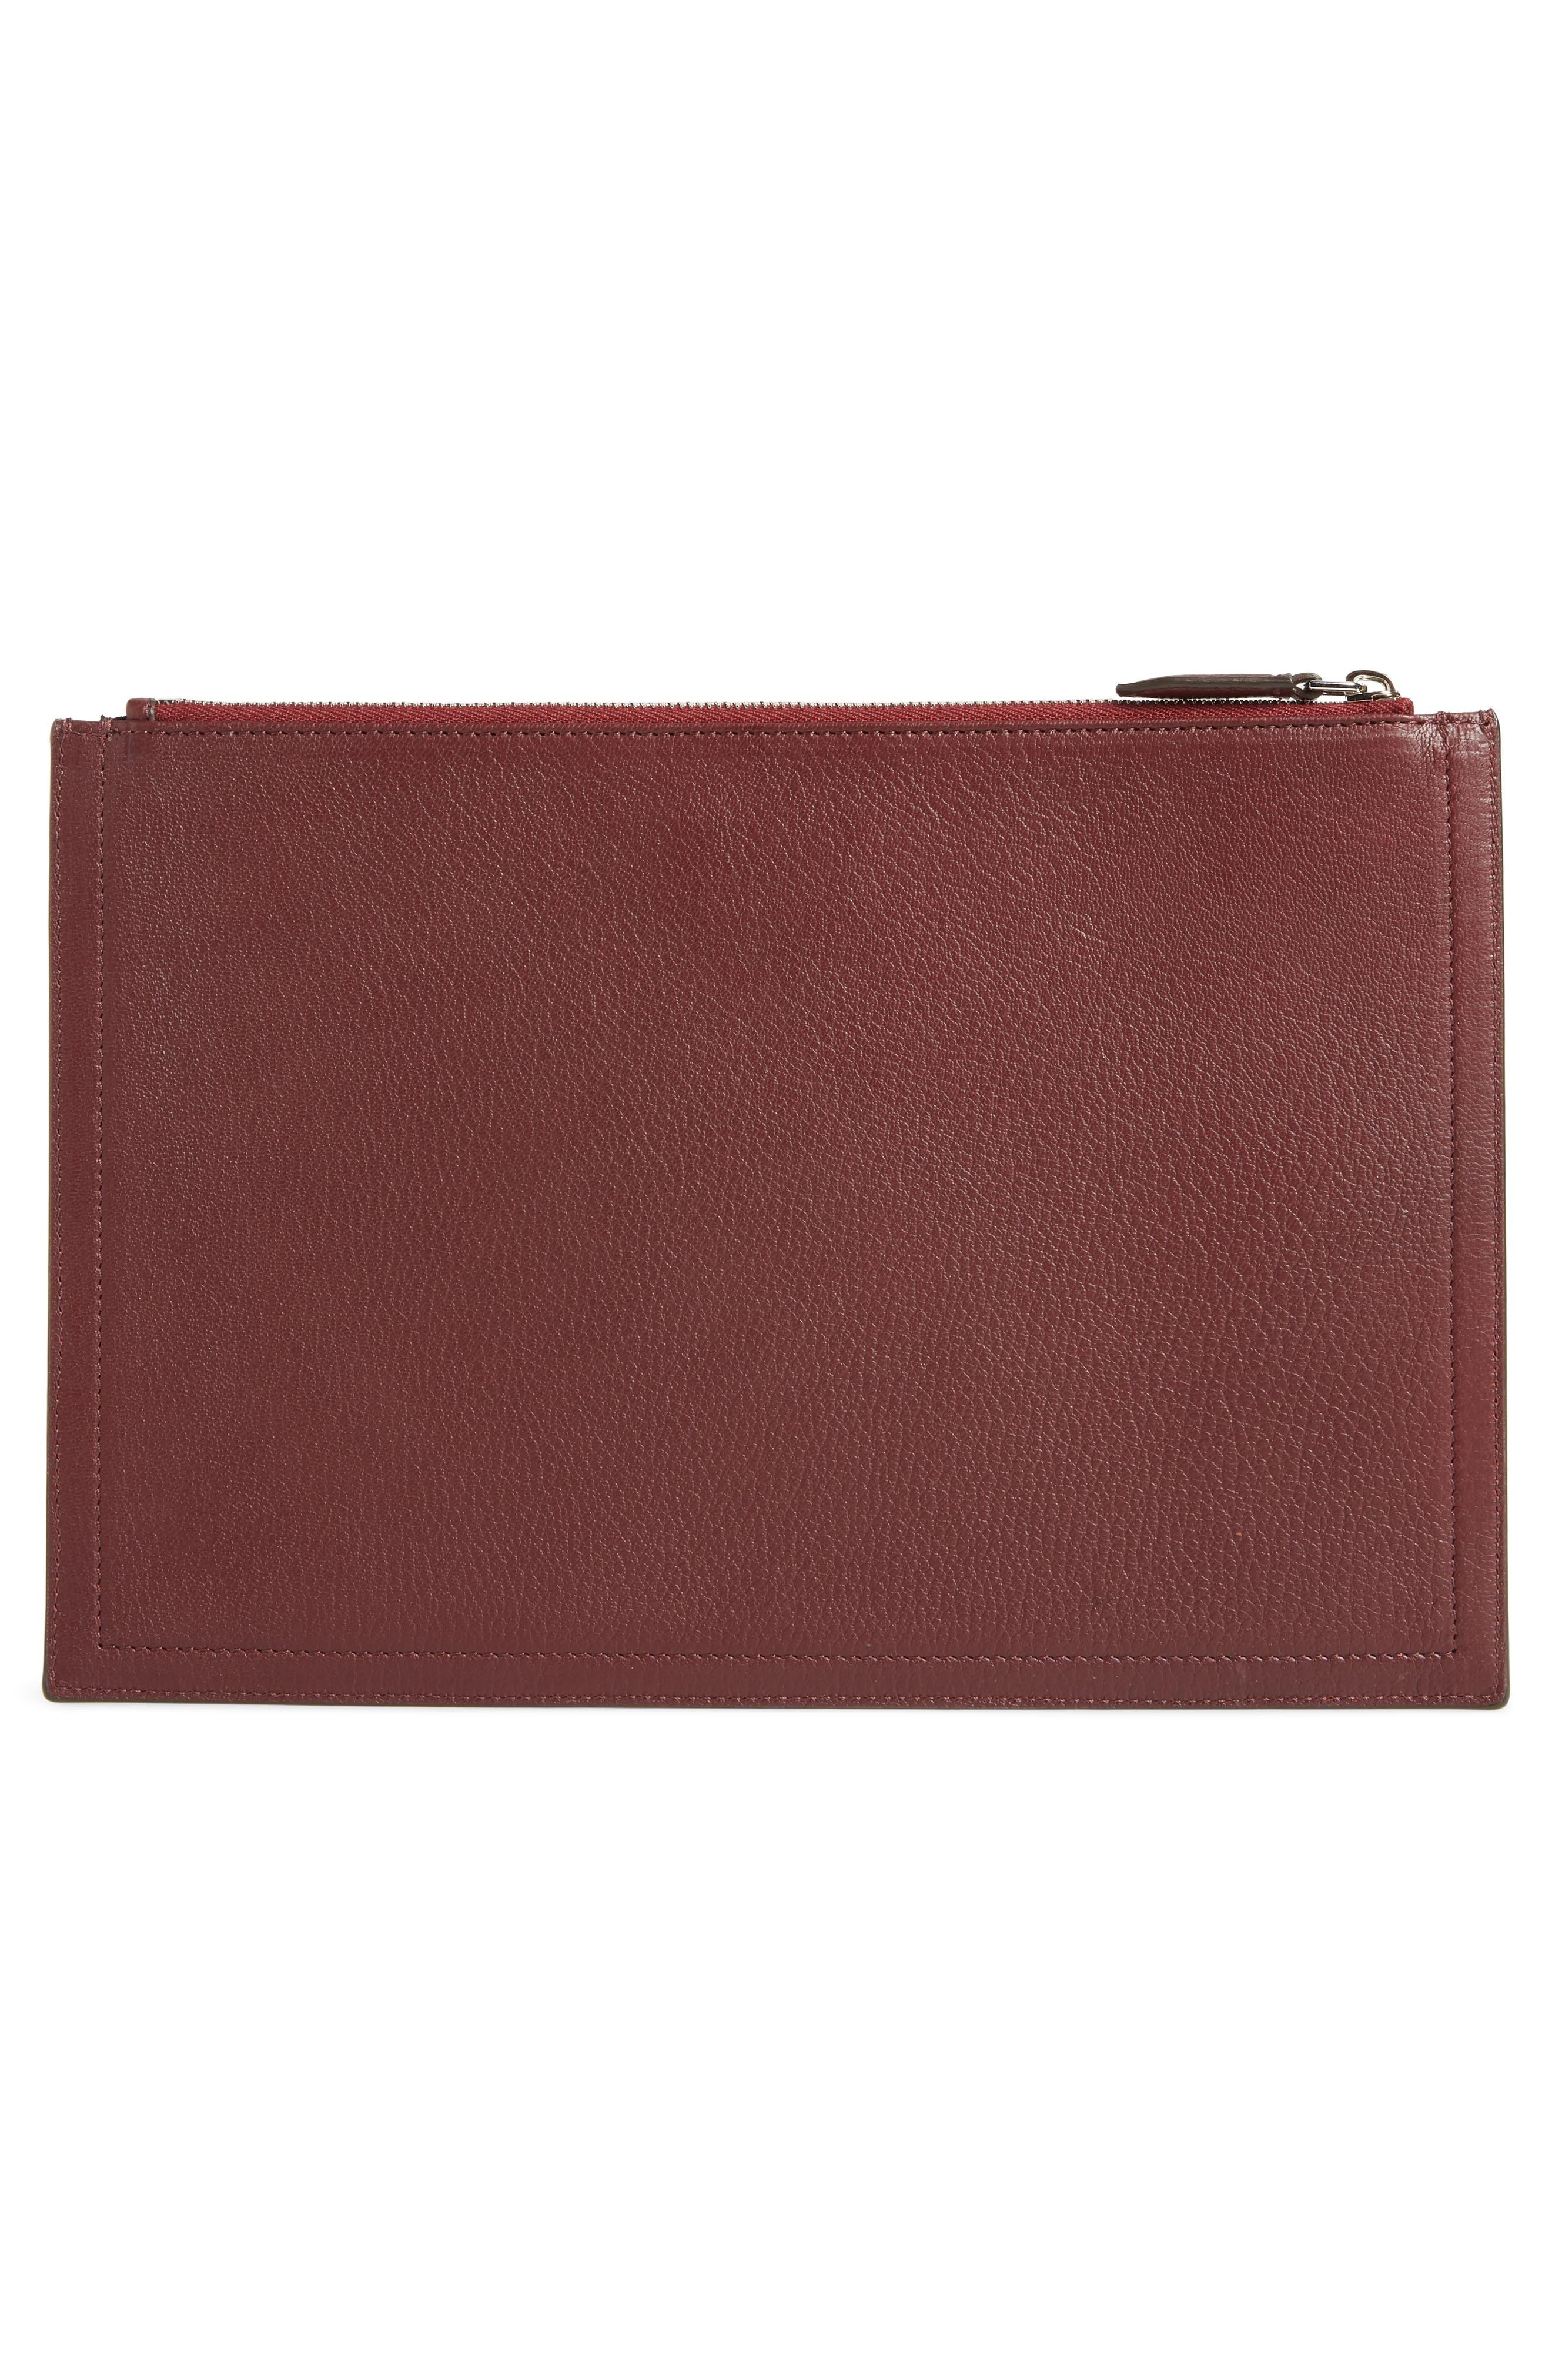 Medium Antigona Leather Pouch,                             Alternate thumbnail 3, color,                             AUBERGINE